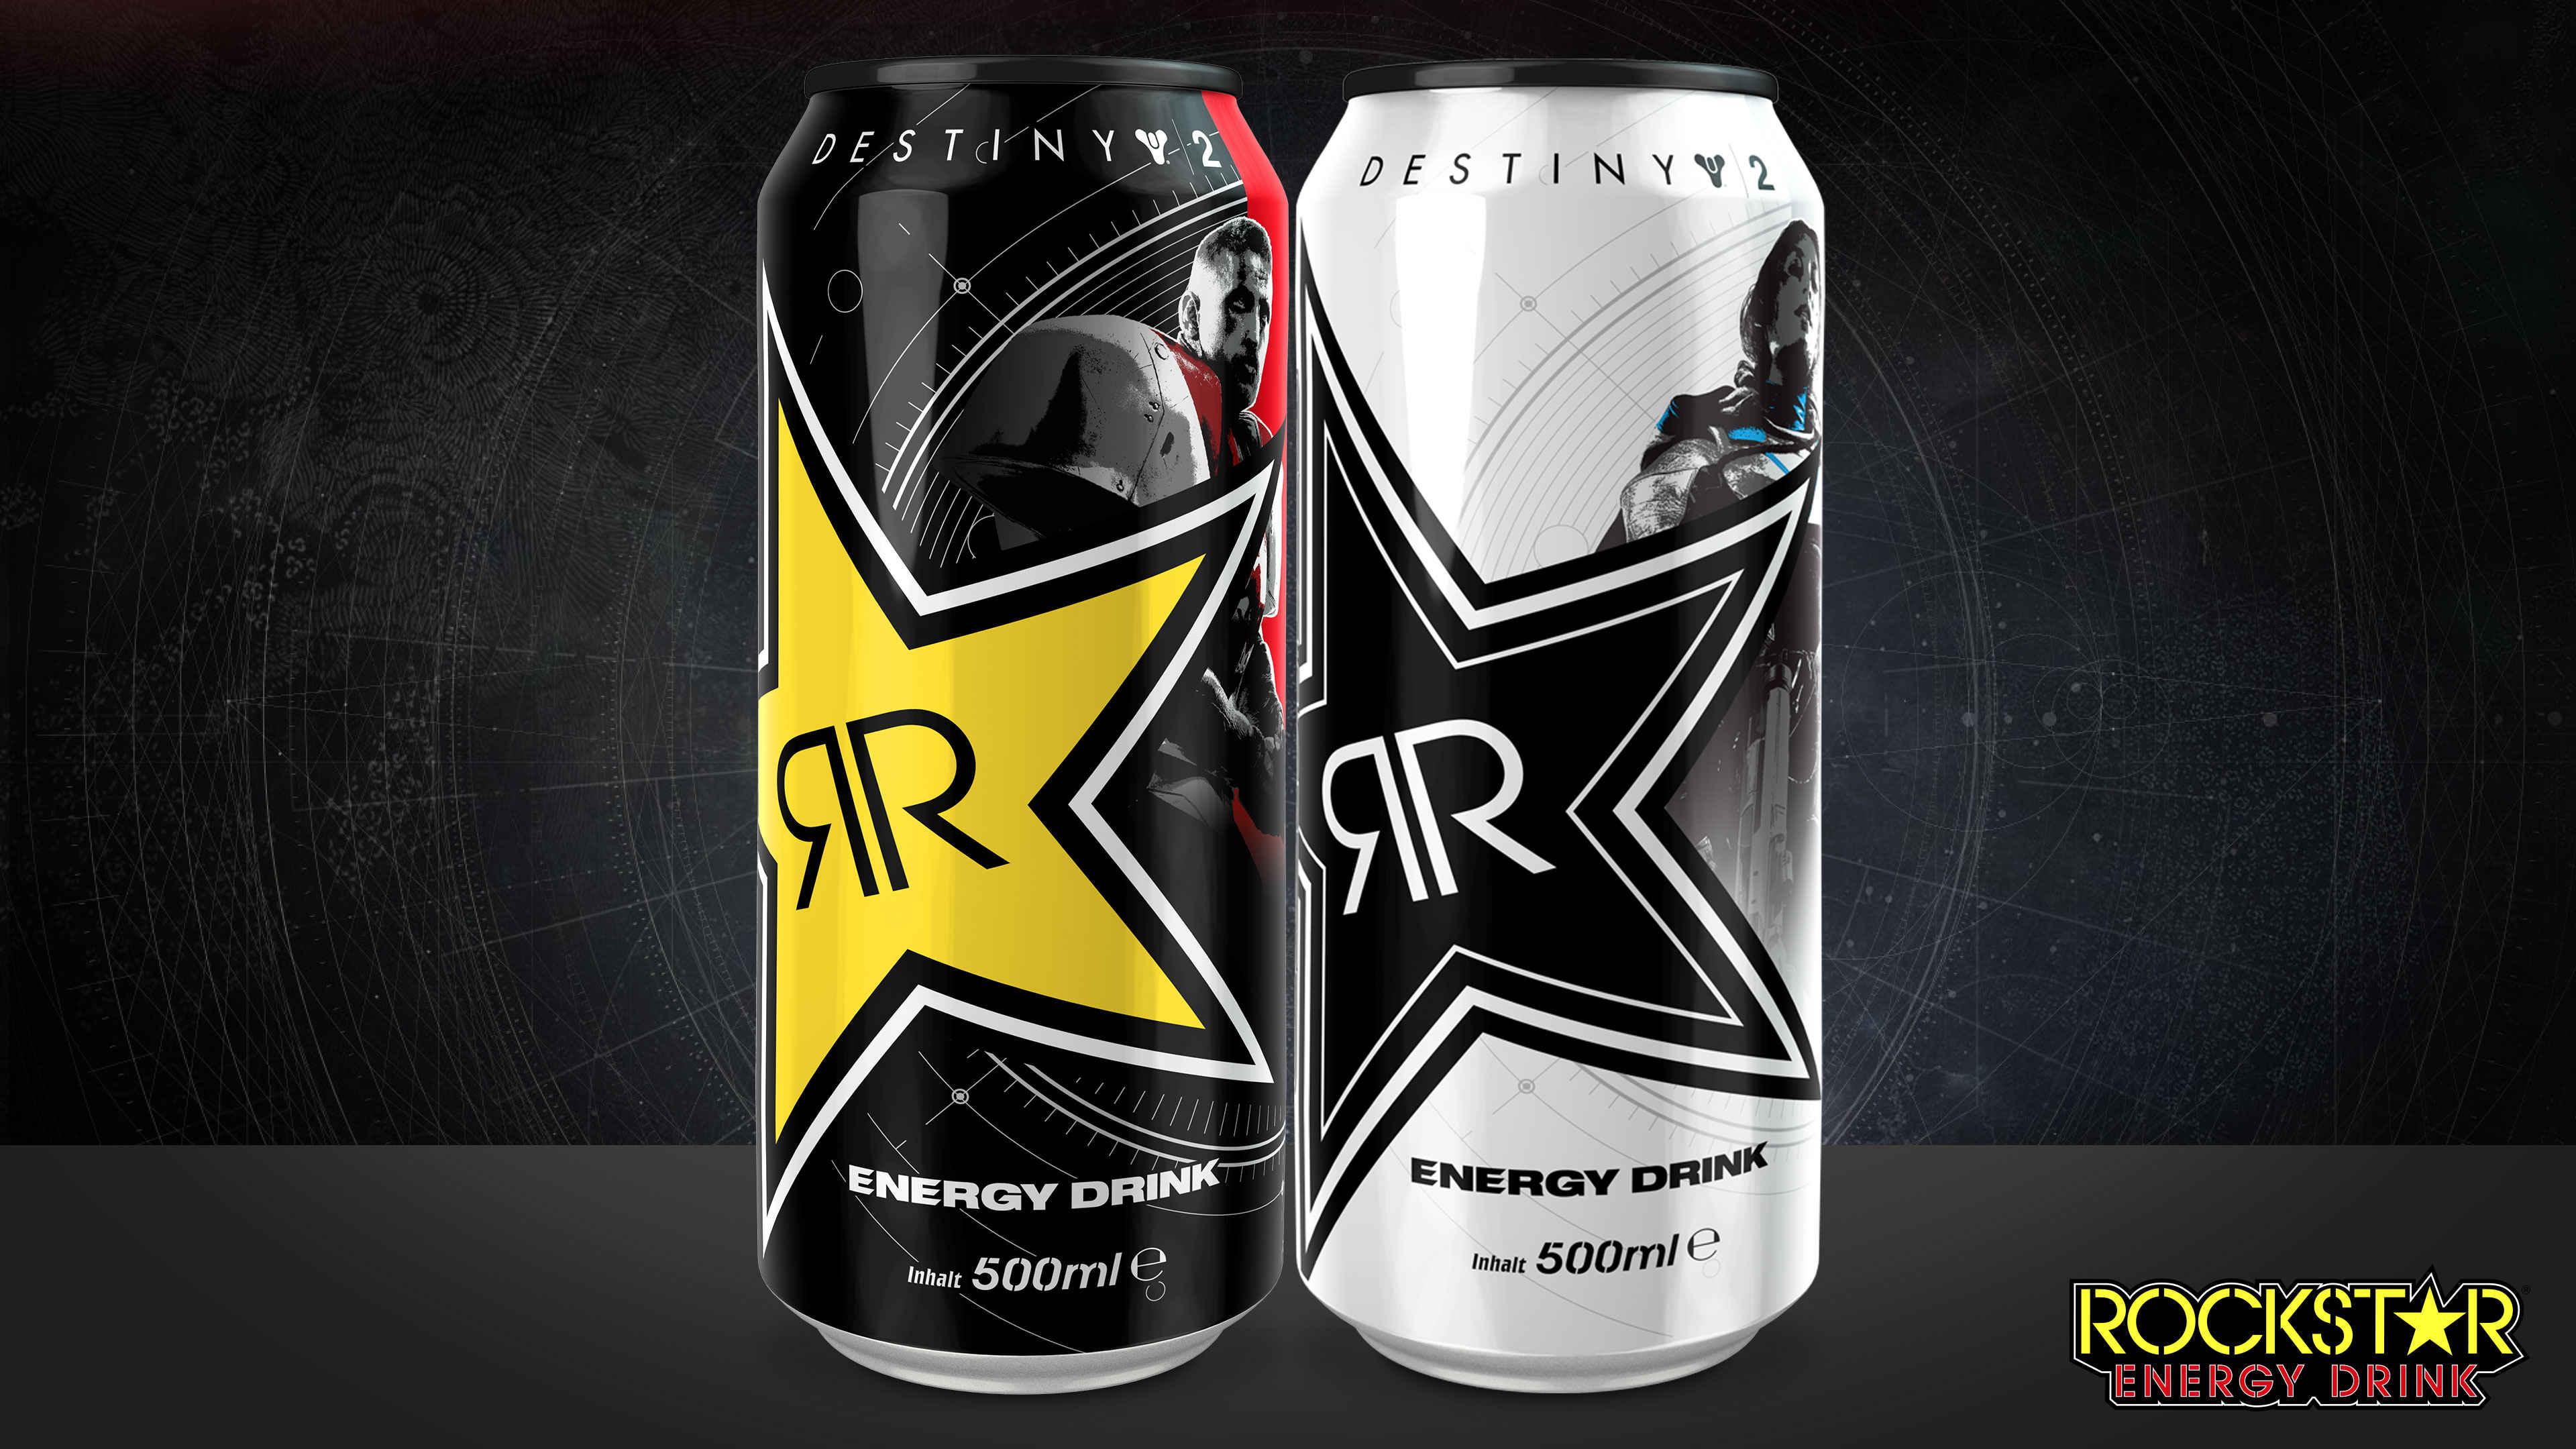 Rockstar Destiny Drink Uk